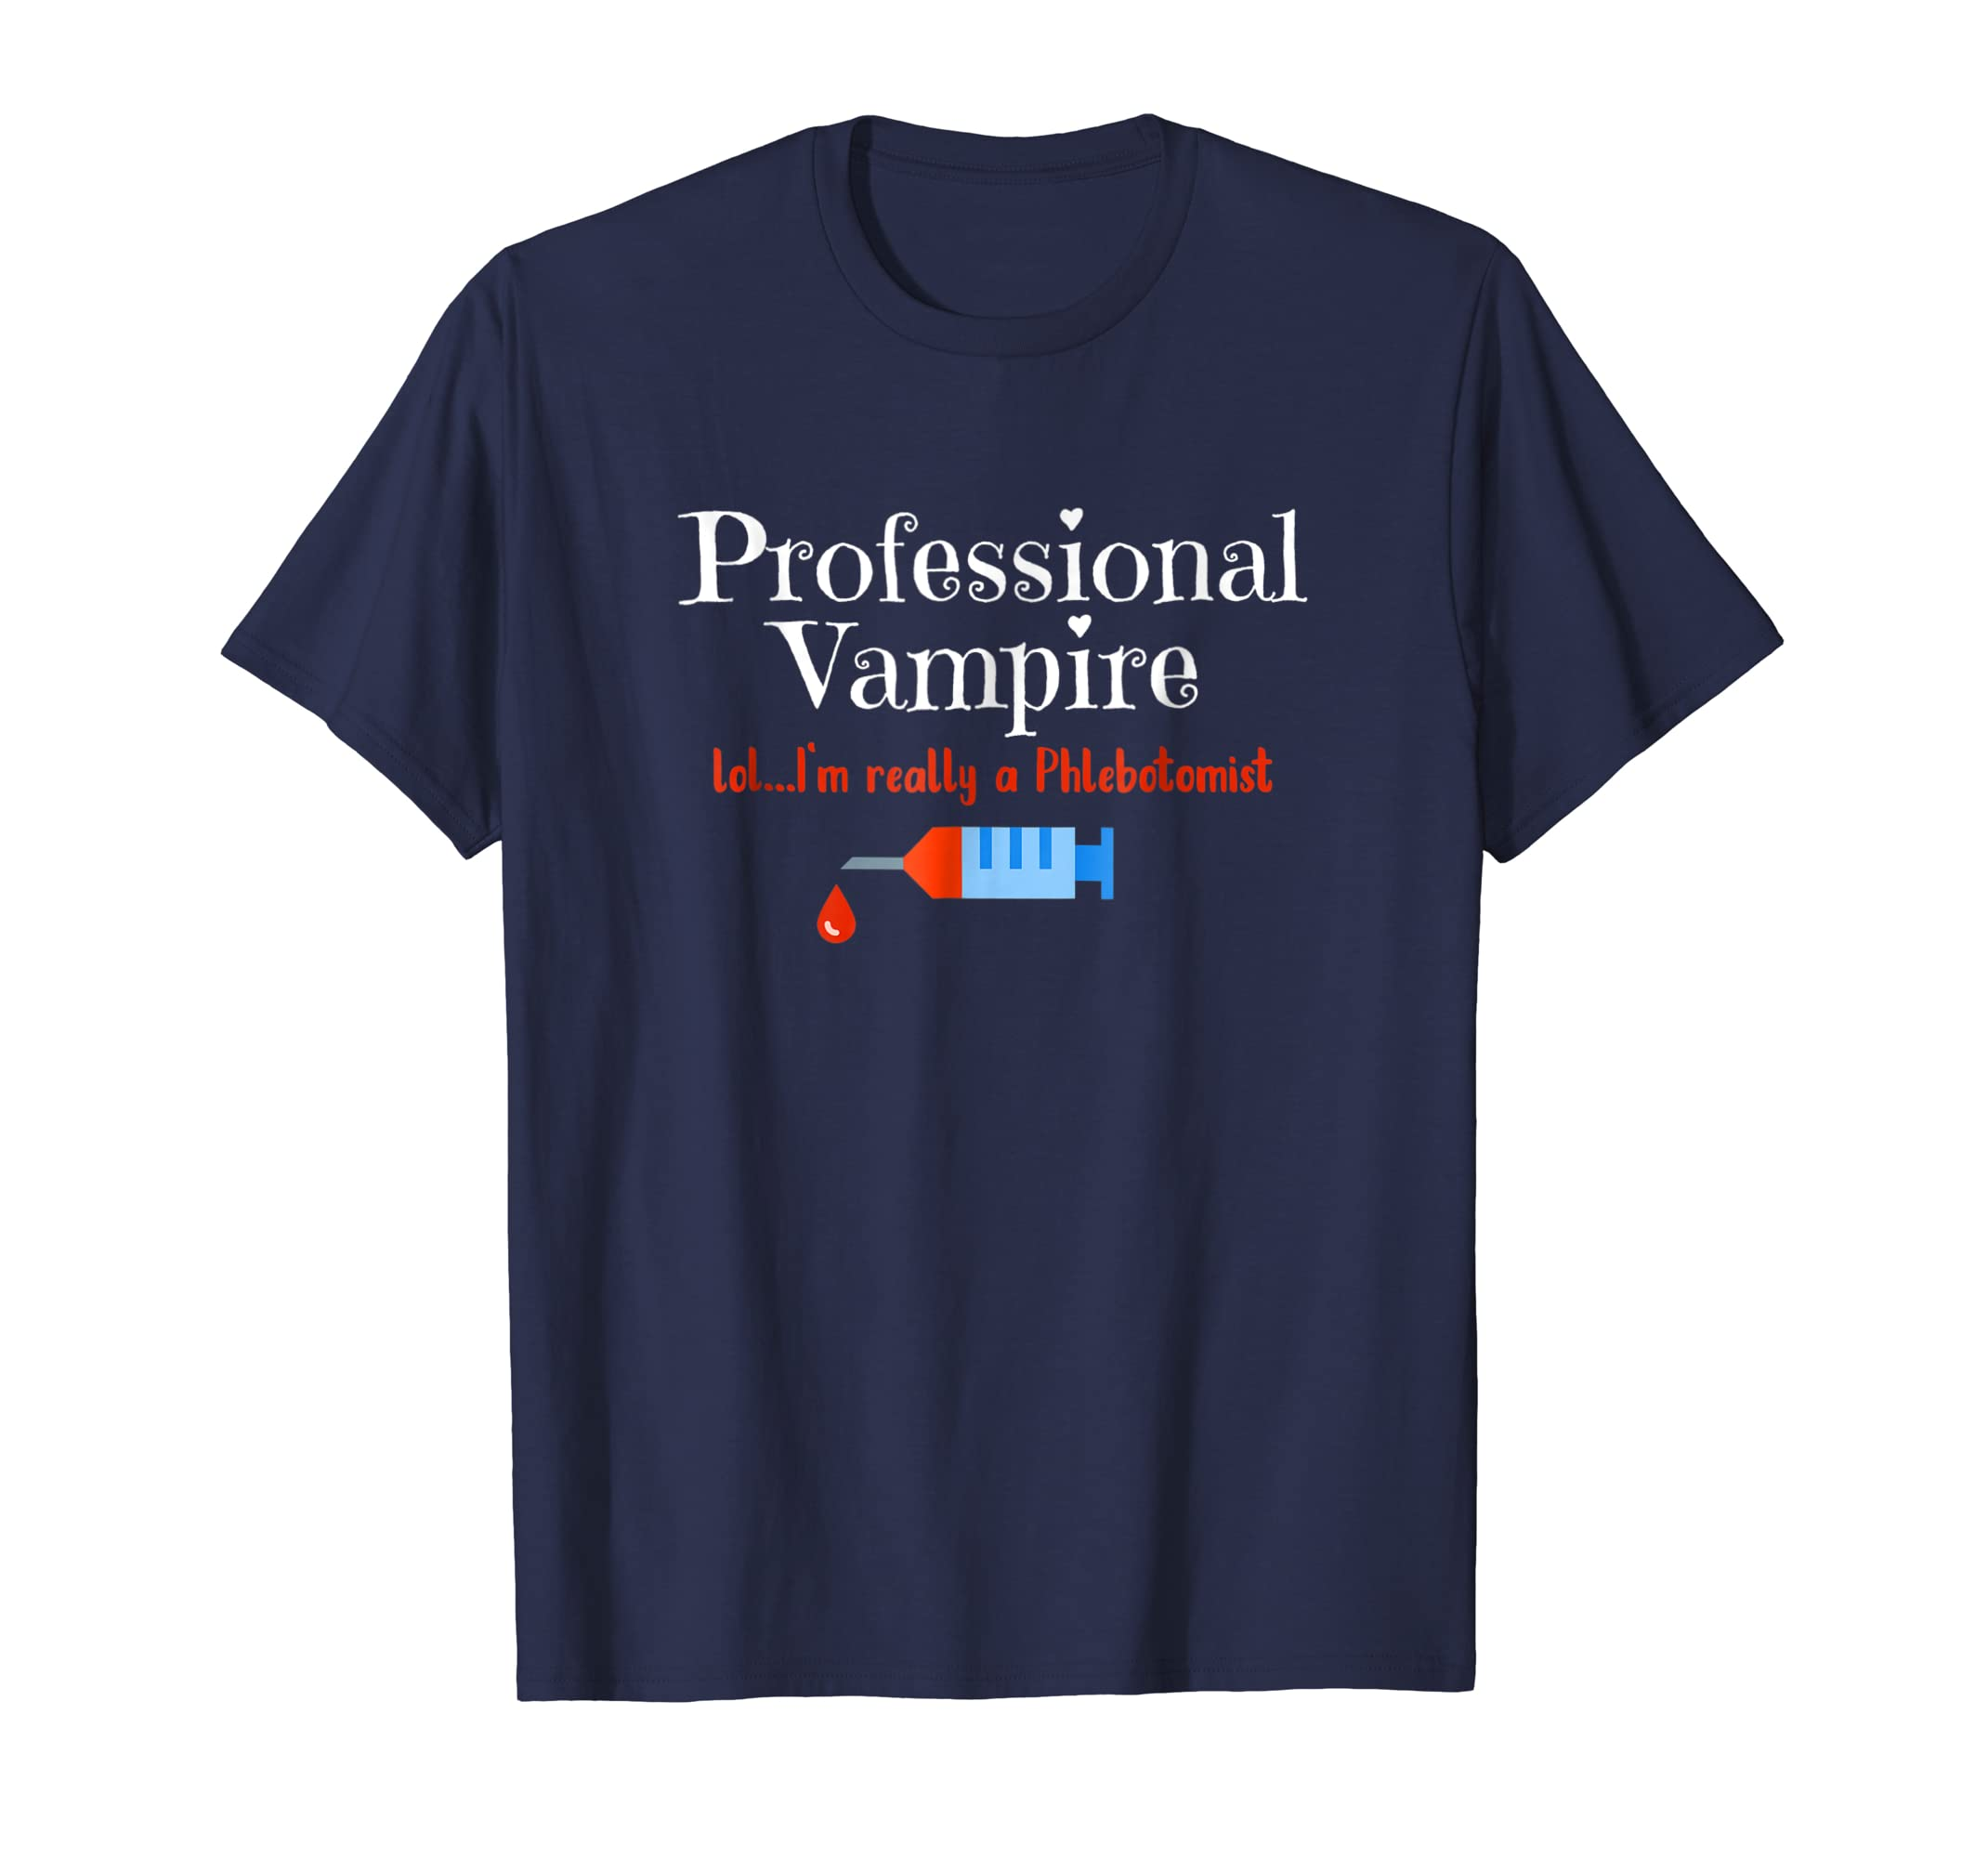 ca611634 Womens Medical Shirt Professional Vampire Phlebotomist